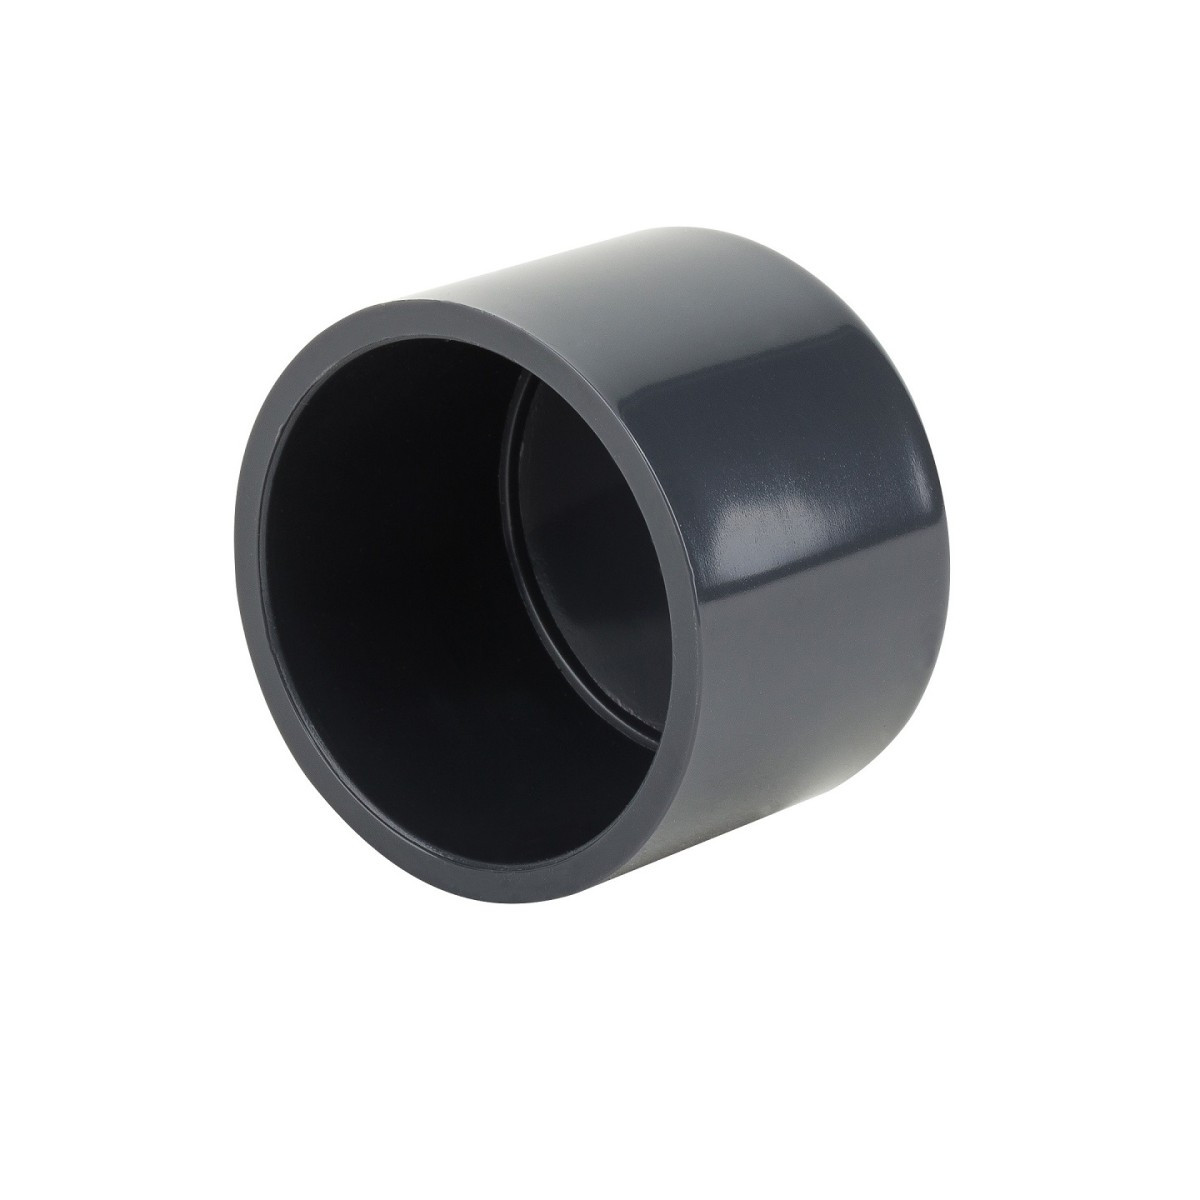 Заглушка ПВХ Aquaviva клеевая, диаметр 32 мм.